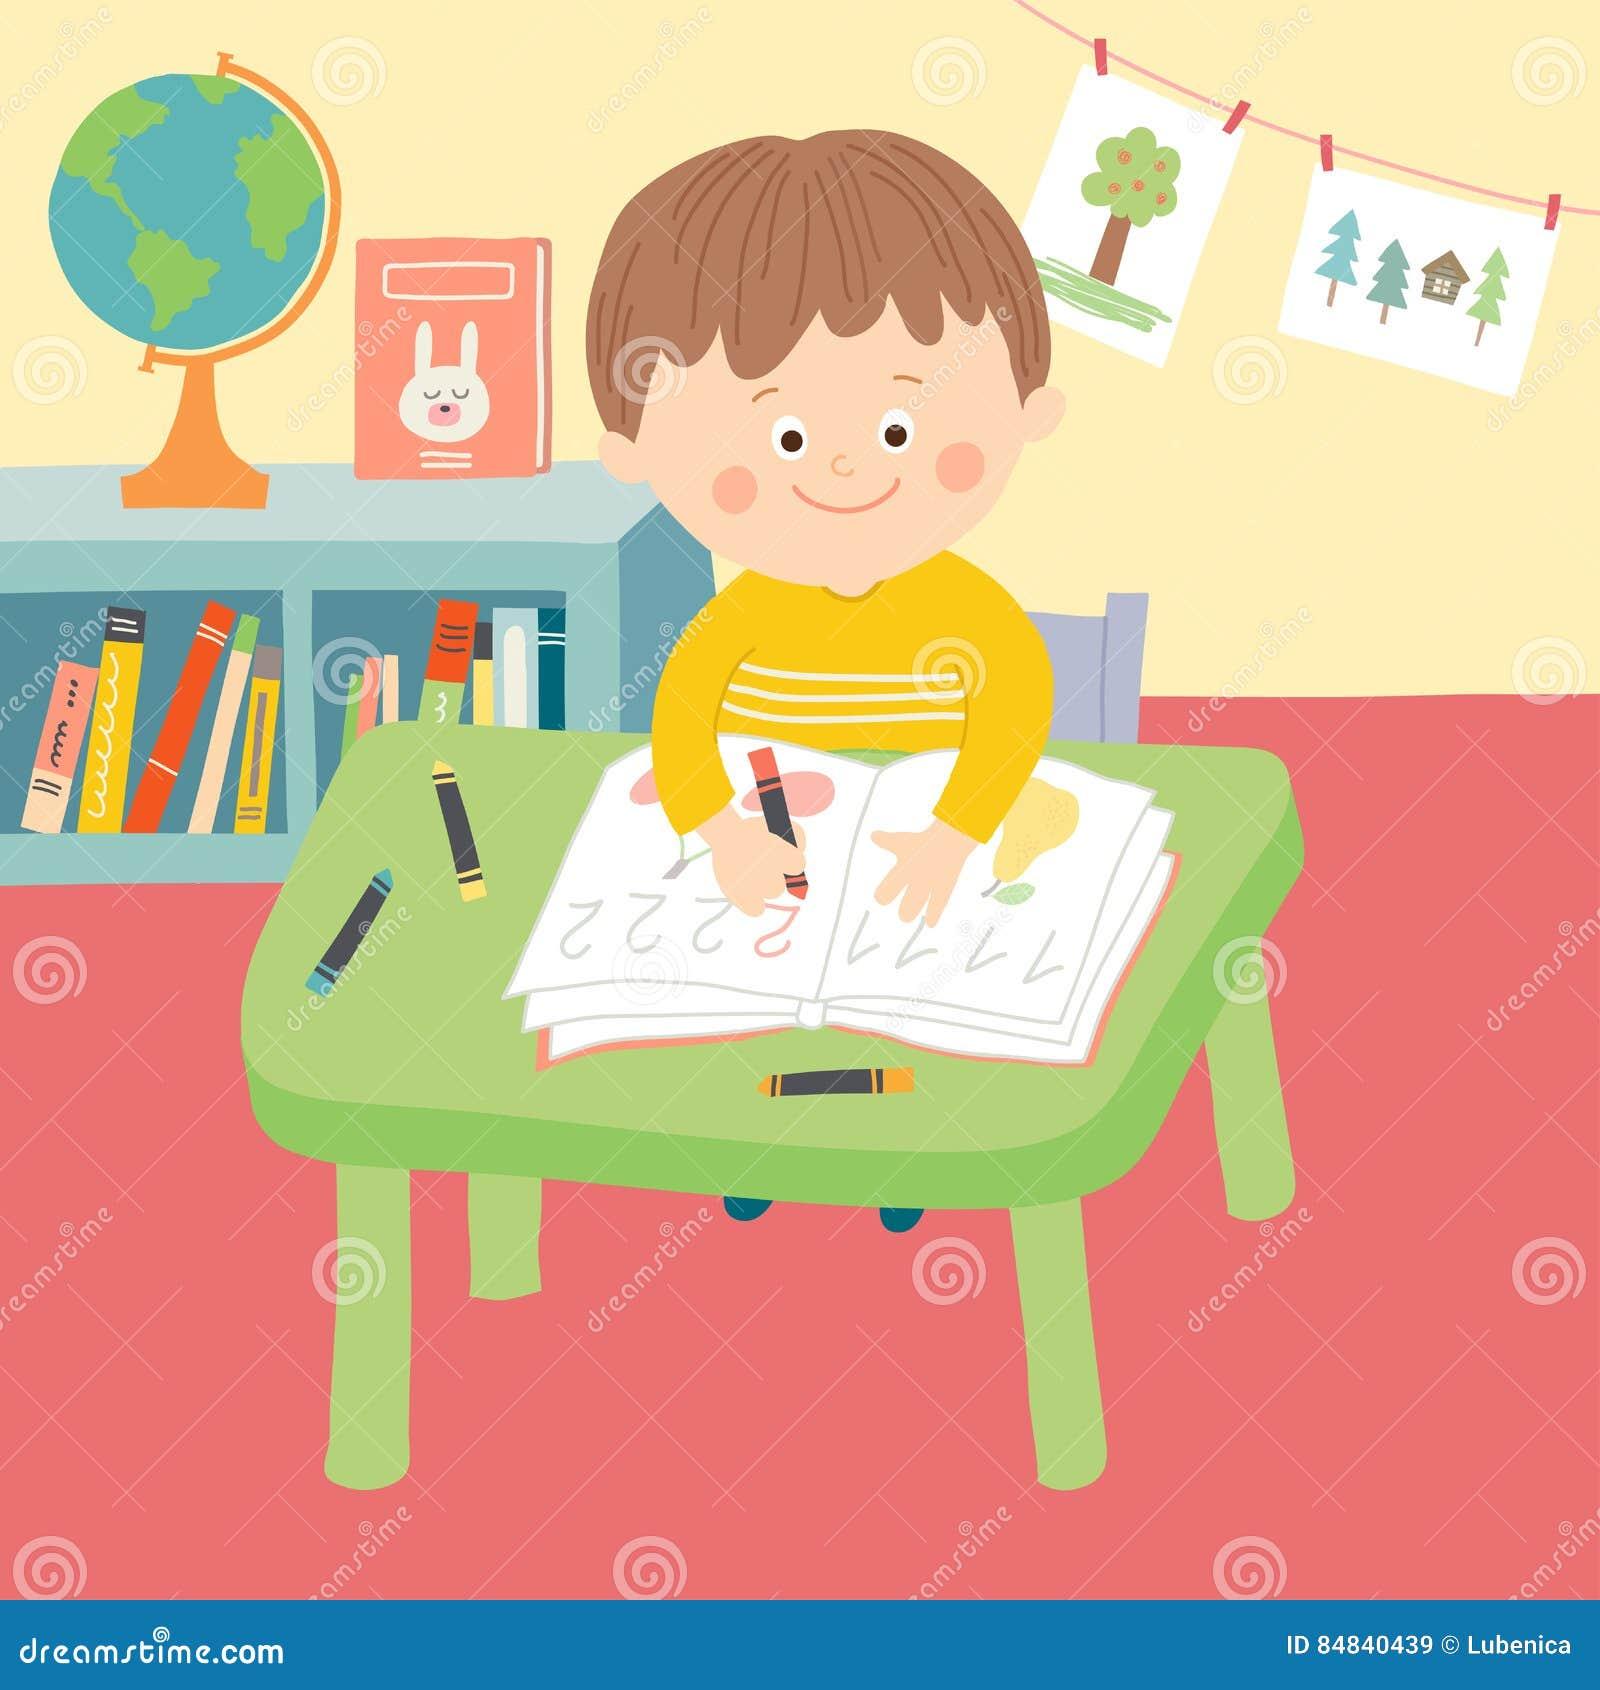 how to draw children sitting